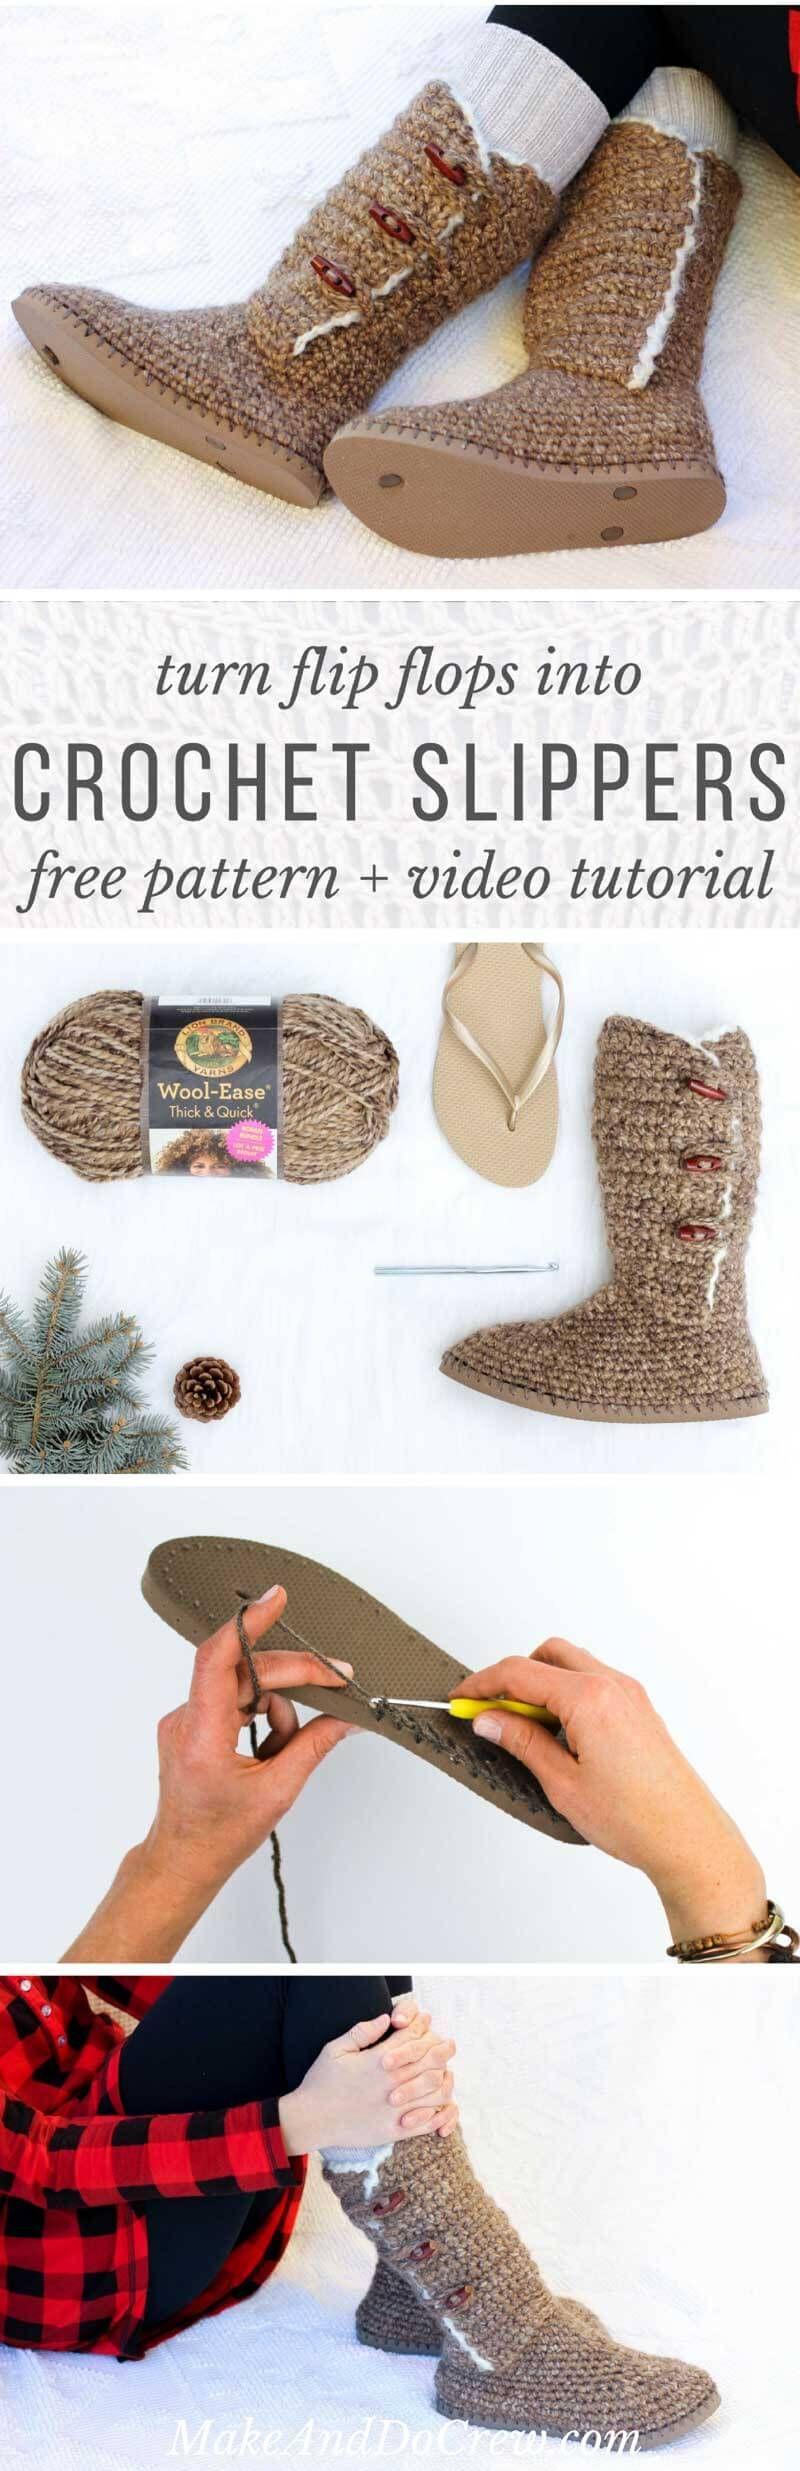 UGG-Style Free Crochet Boots Pattern Using Flip Flops | Alpargatas ...